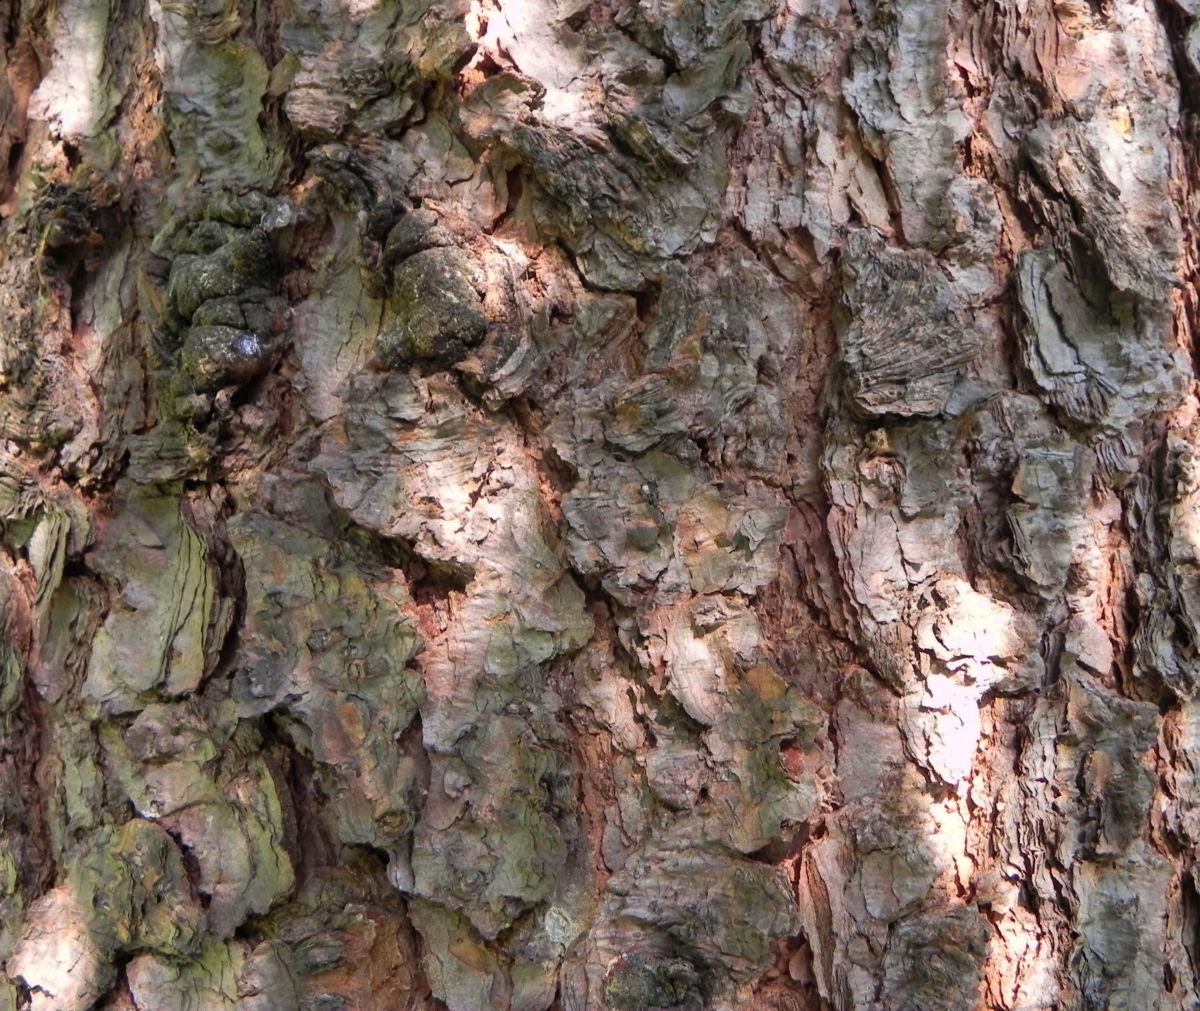 Borsten Fichte Borke braun Picea asperata